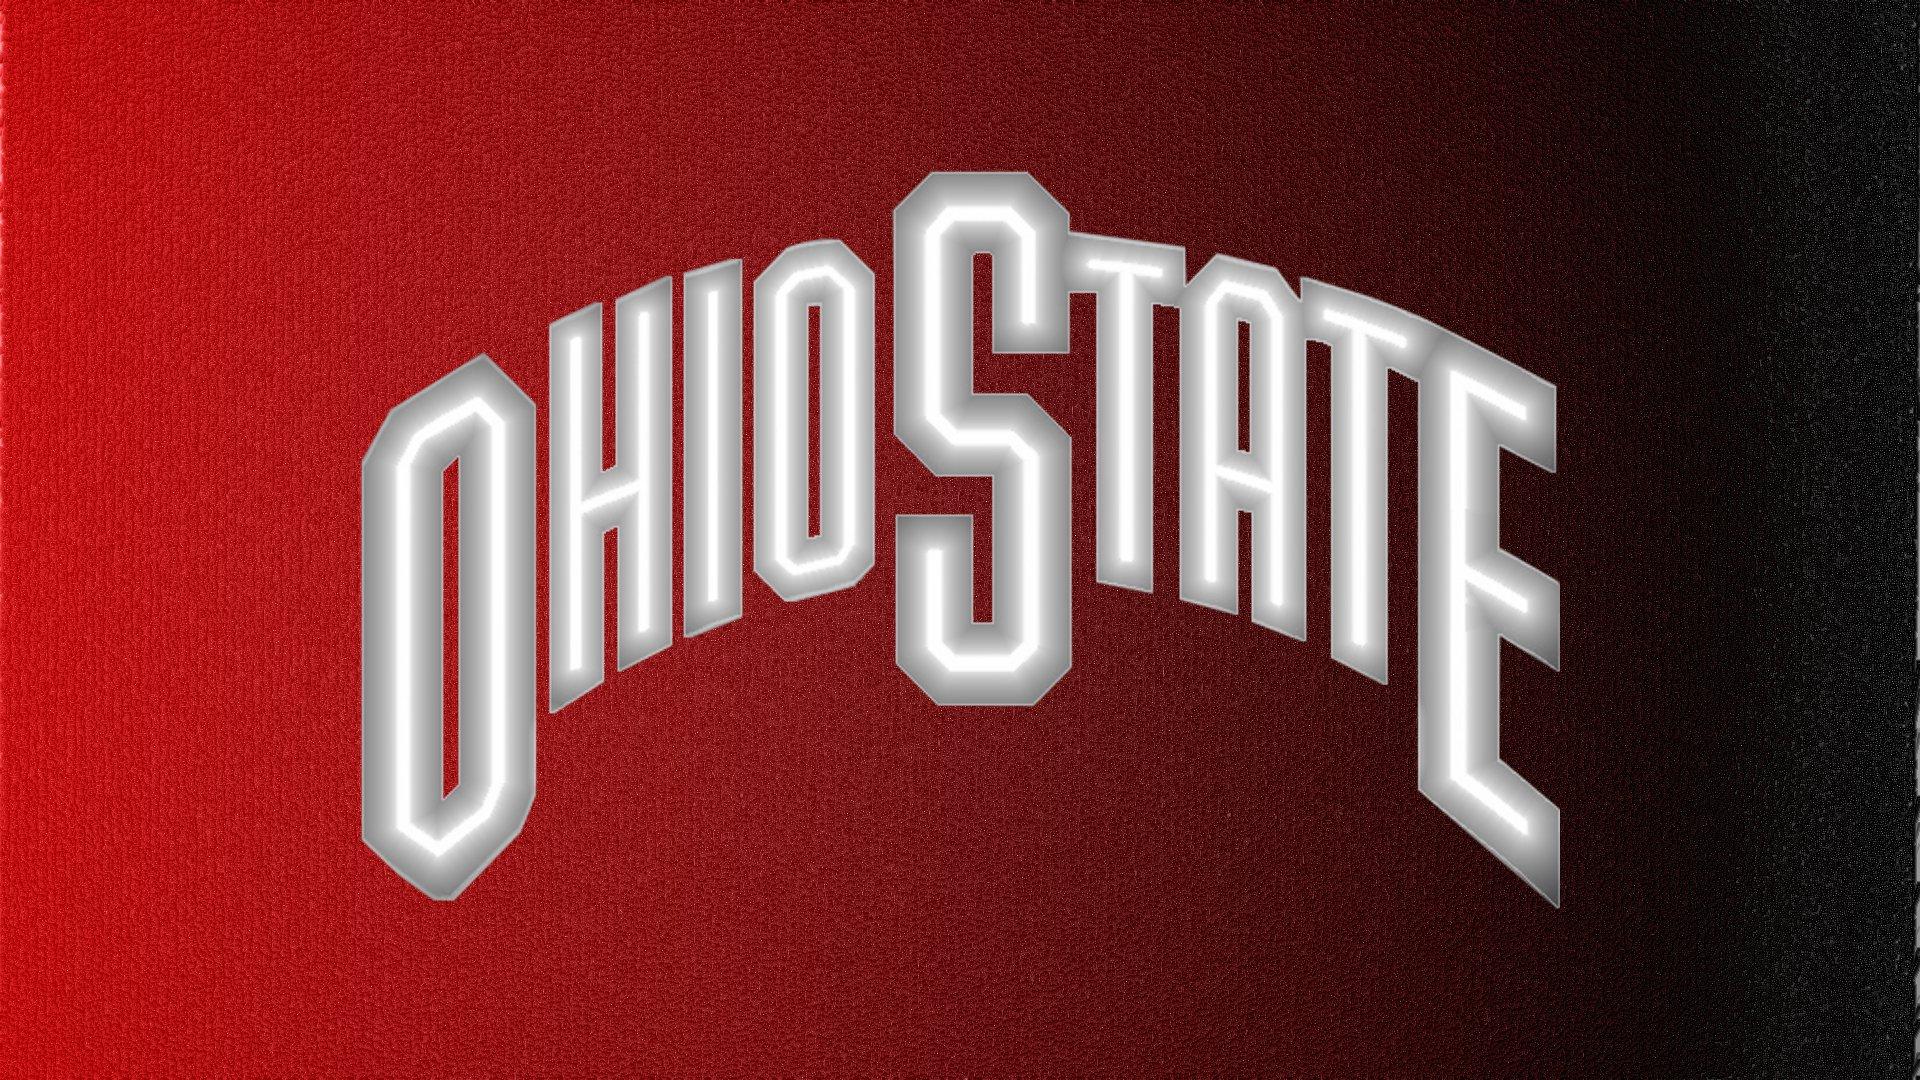 OSU Wallpaper 43   Ohio State Football Wallpaper 29371797 1920x1080